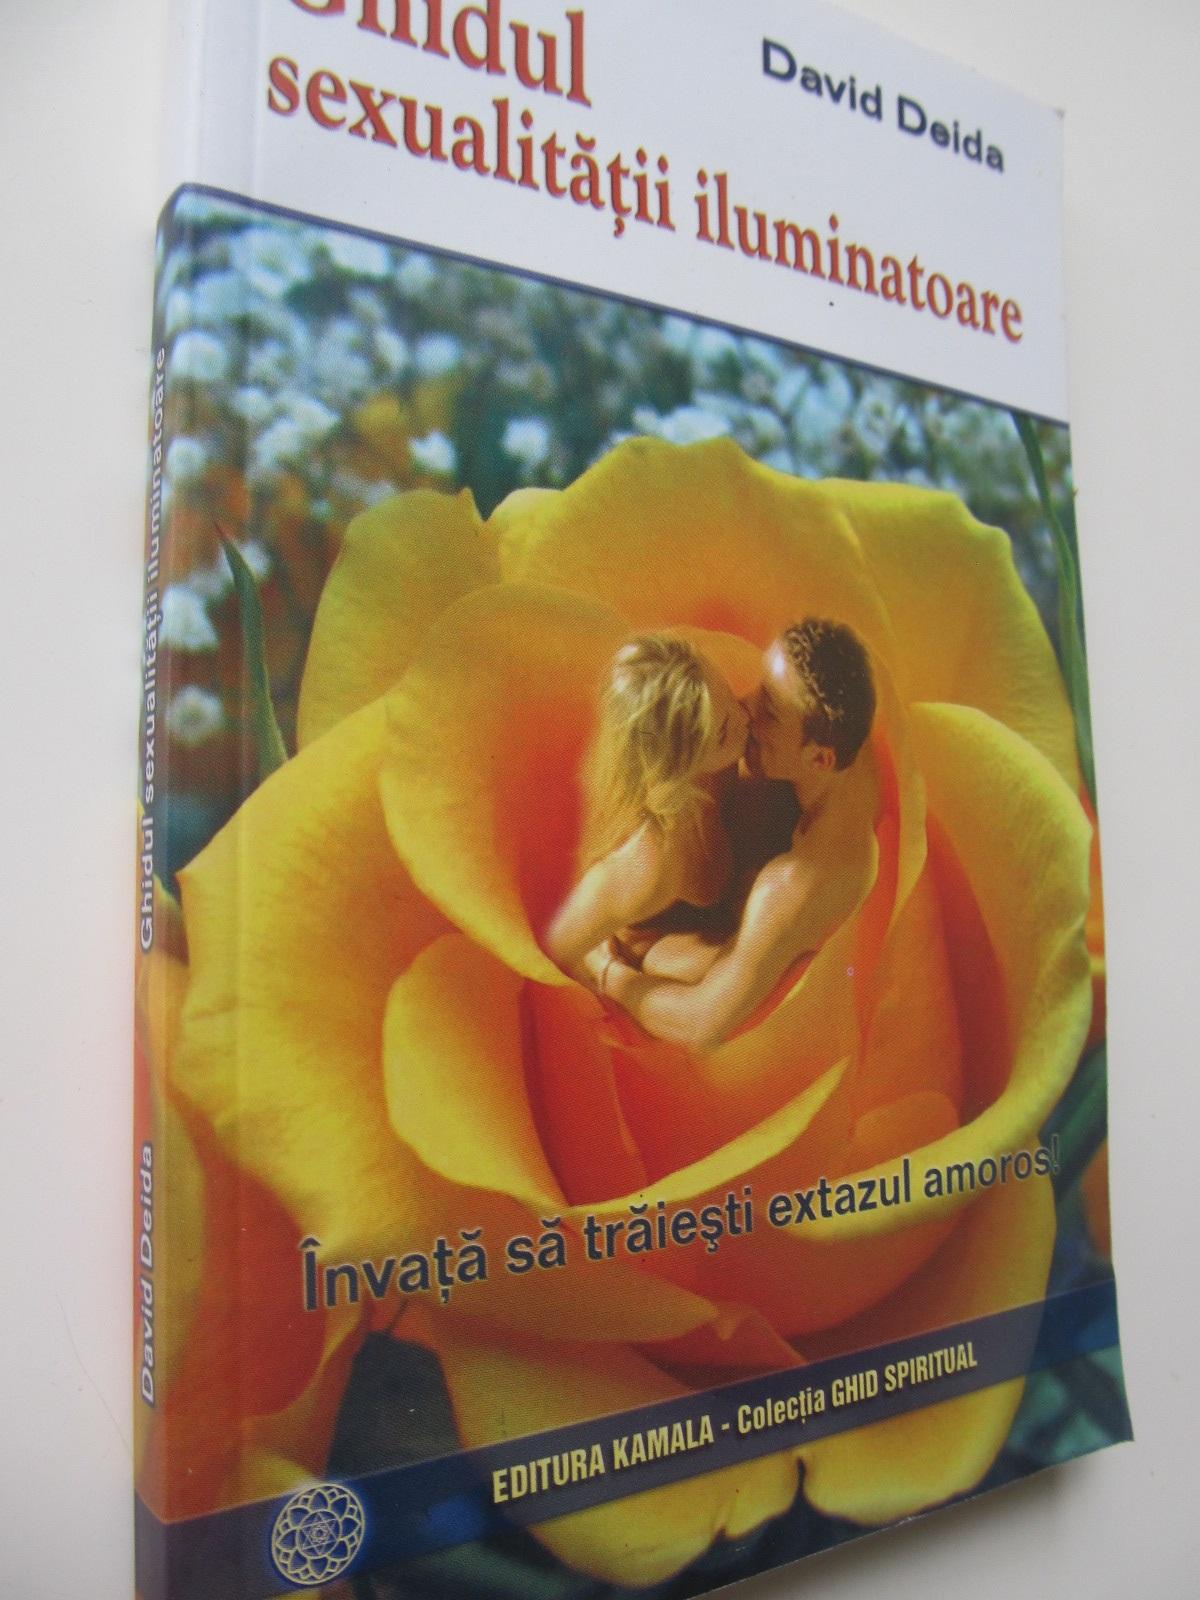 Ghidul sexualitatii iluminatoare - Invata sa traiesti extazul amoros - David Deida | Detalii carte